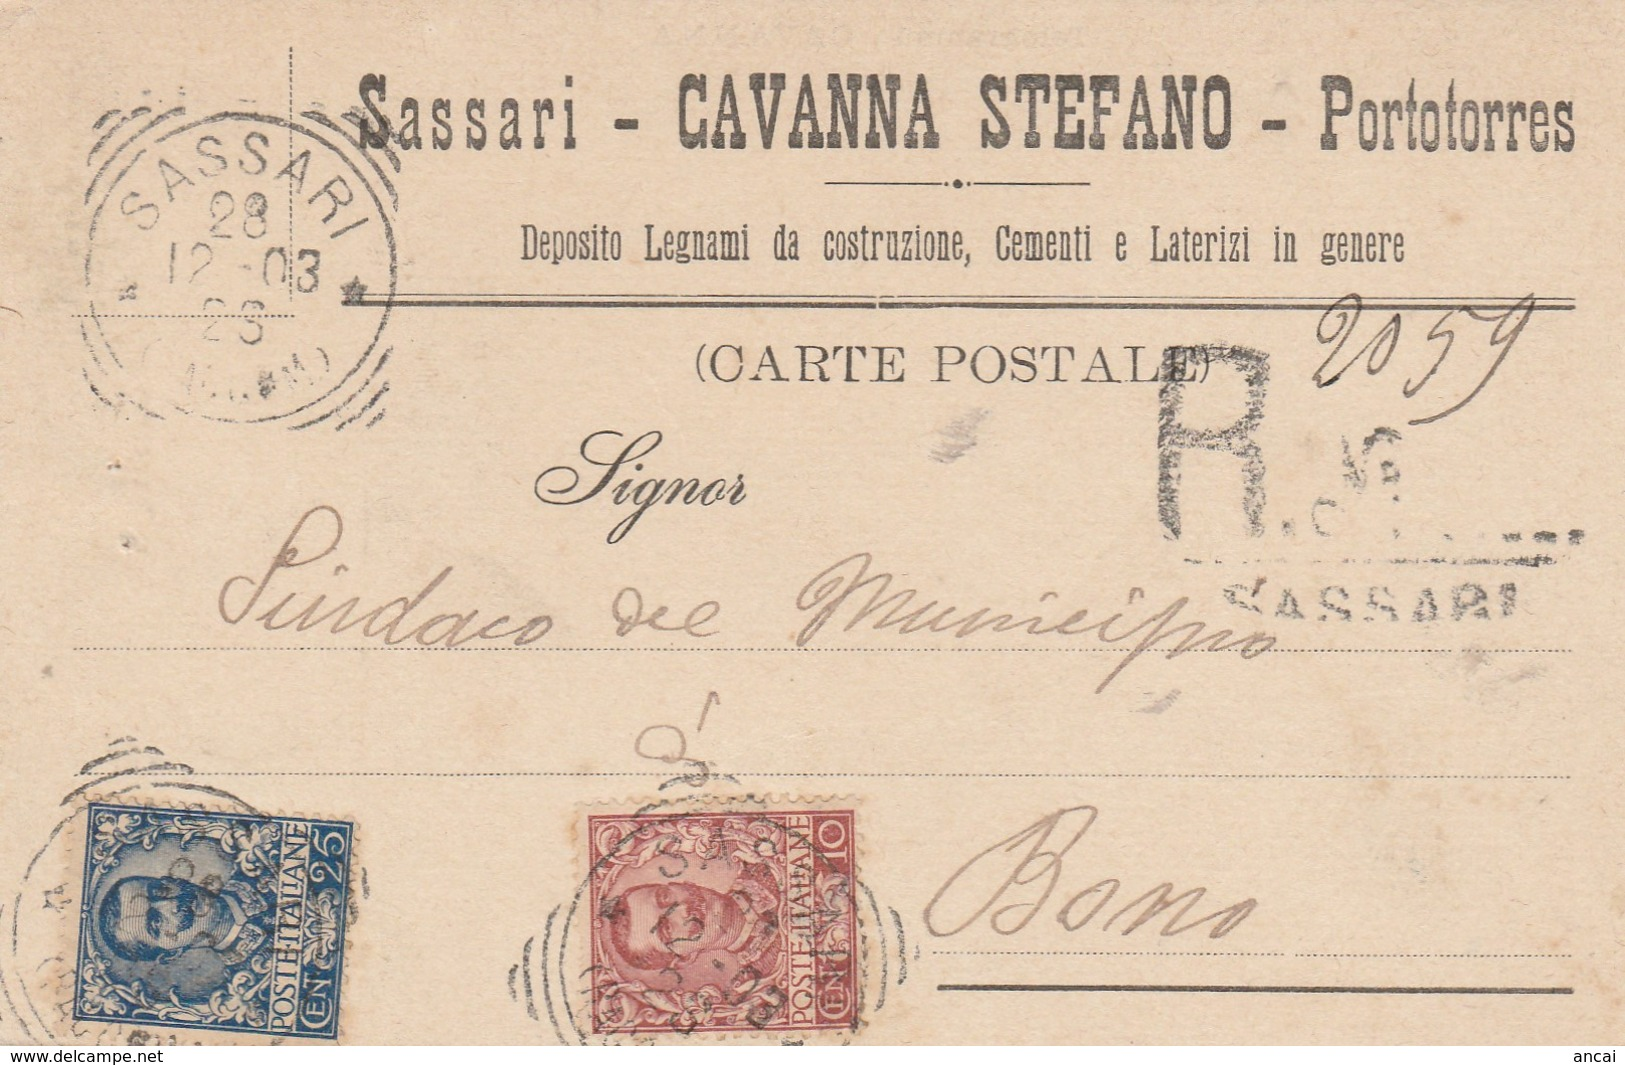 Sassari. 1903. Annullo Tondo Riquadrato SASSARI (RACCOM.), Su Cartolina Pubblicitaria Raccomandata. BELLA. - Storia Postale